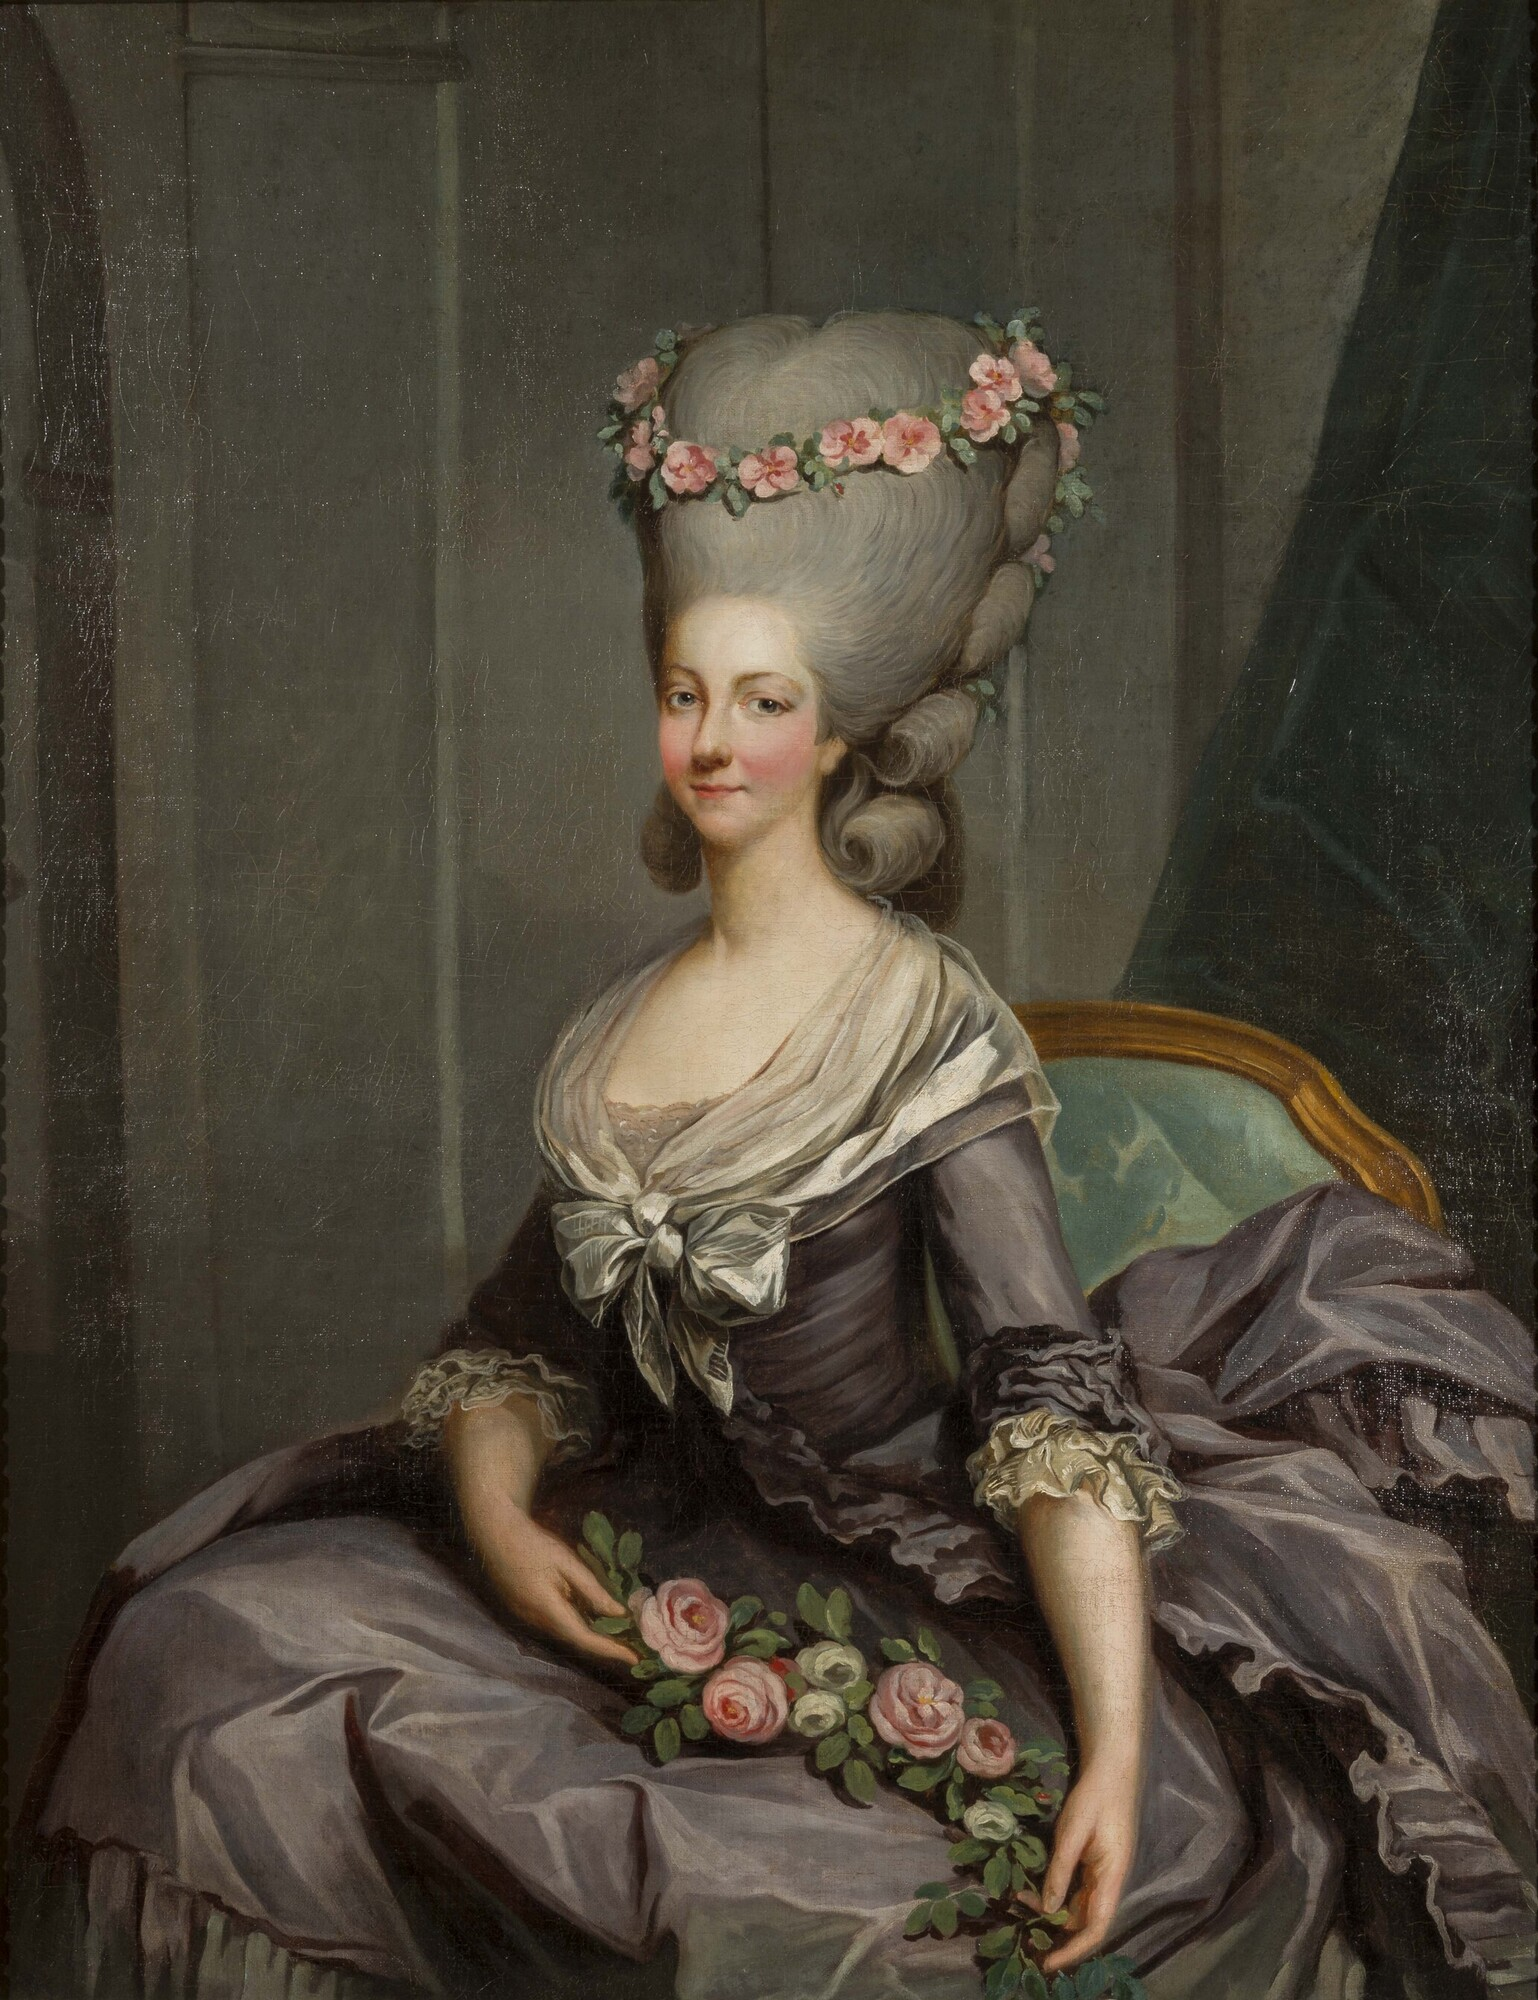 File:Marie Louise Thérèse of Savoy (Princess of Lamballe) by Antoine-François Callet, circa 1776, Versailles.jpg